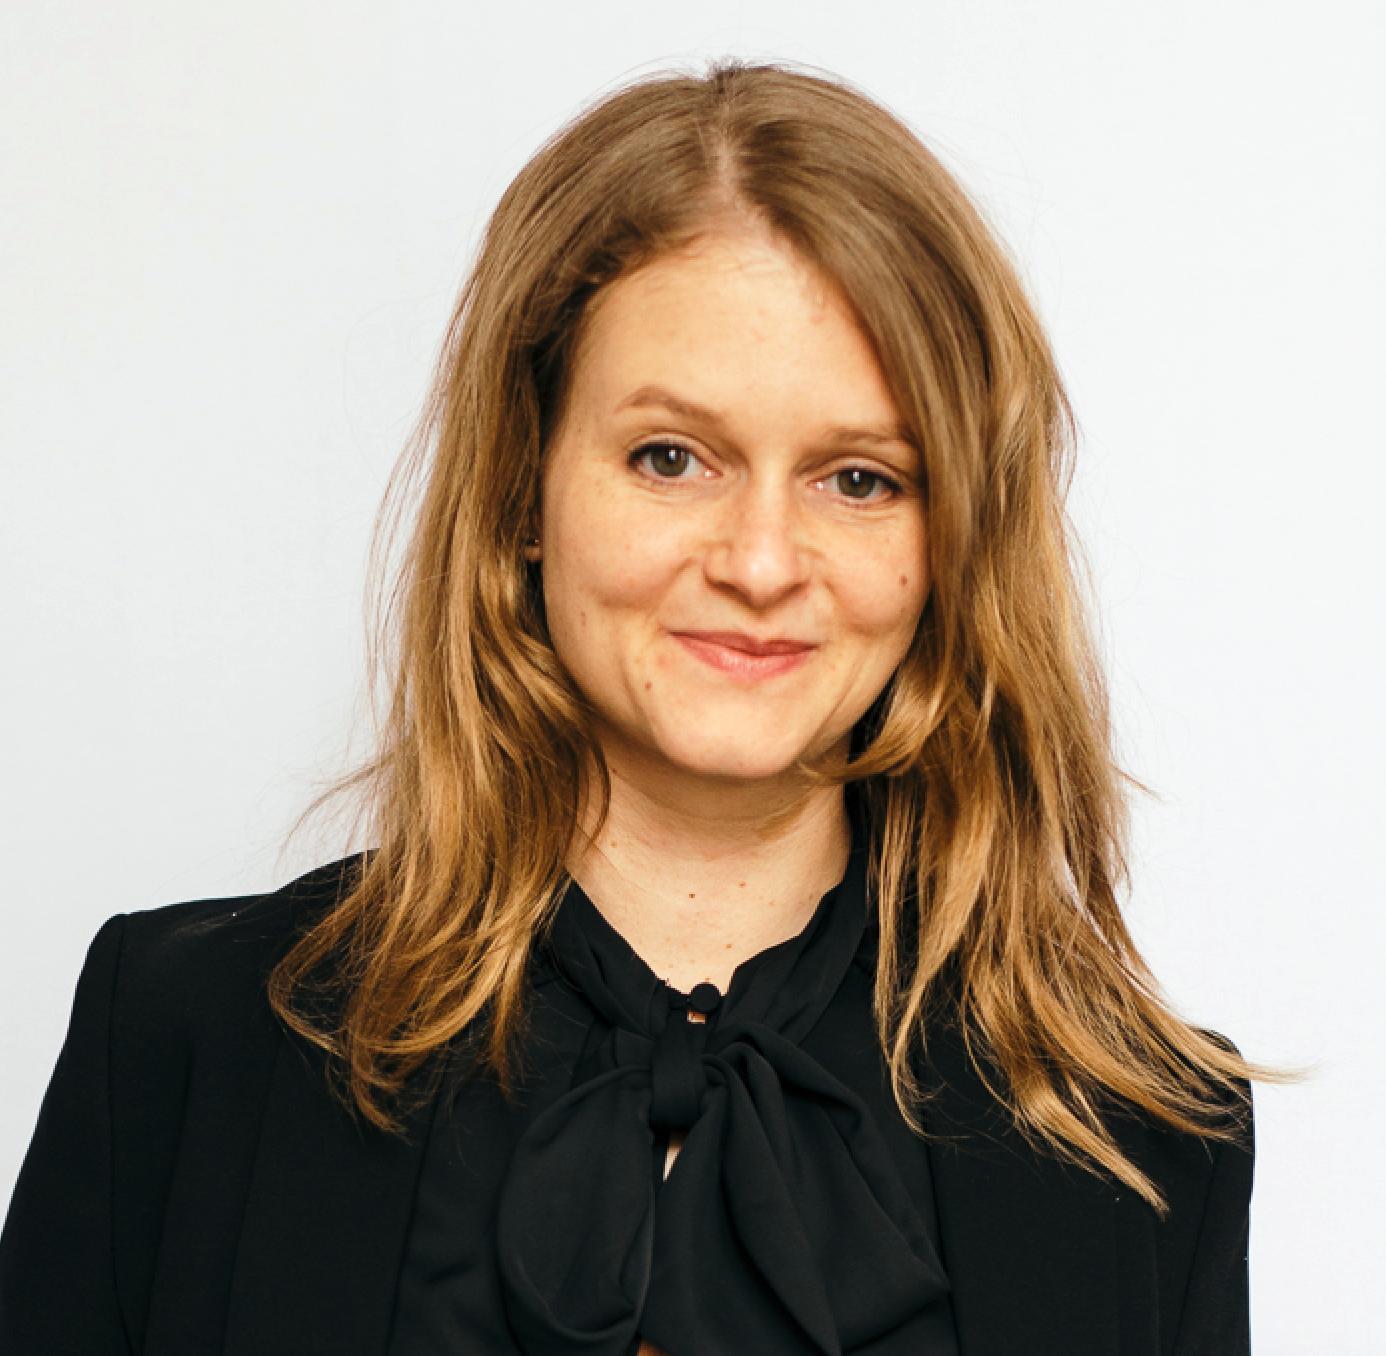 Anna Maciejowski ist neue Programmleiterin